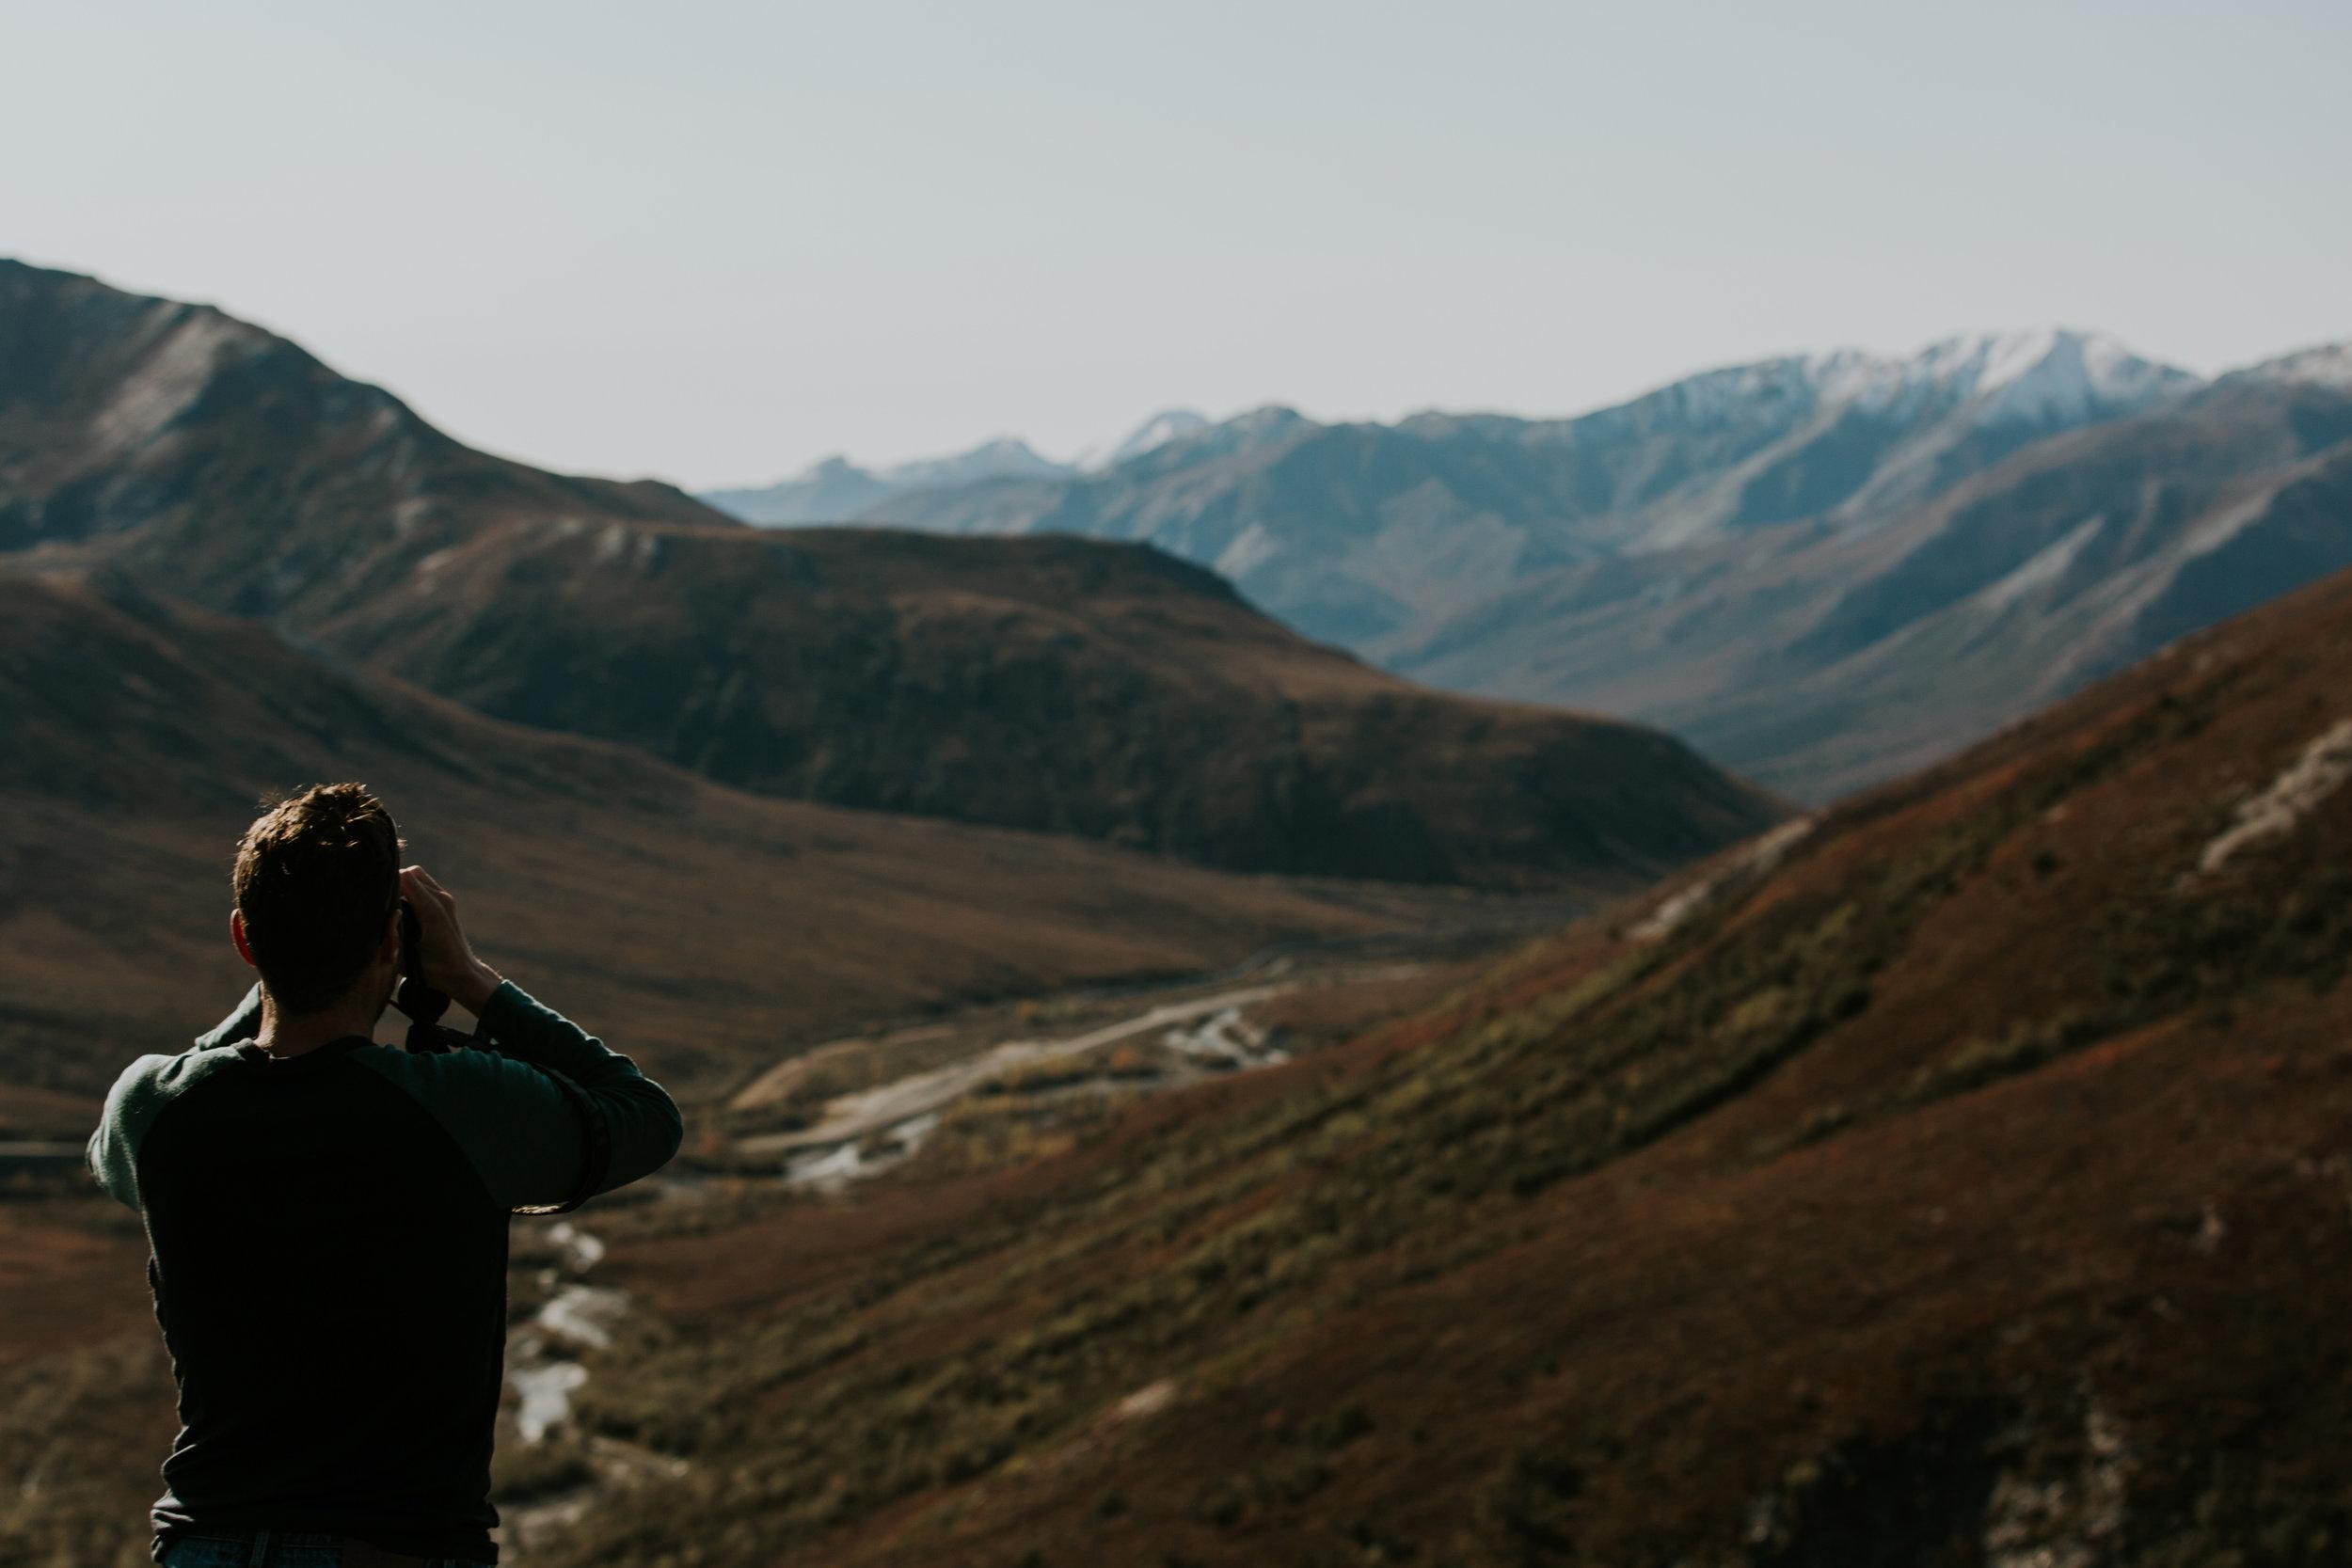 CindyGiovagnoli_Alaska_KoyukukRiver_SukakpakMountain_JimRiver_ArcticCircle_fly_fishing_September-007.jpg